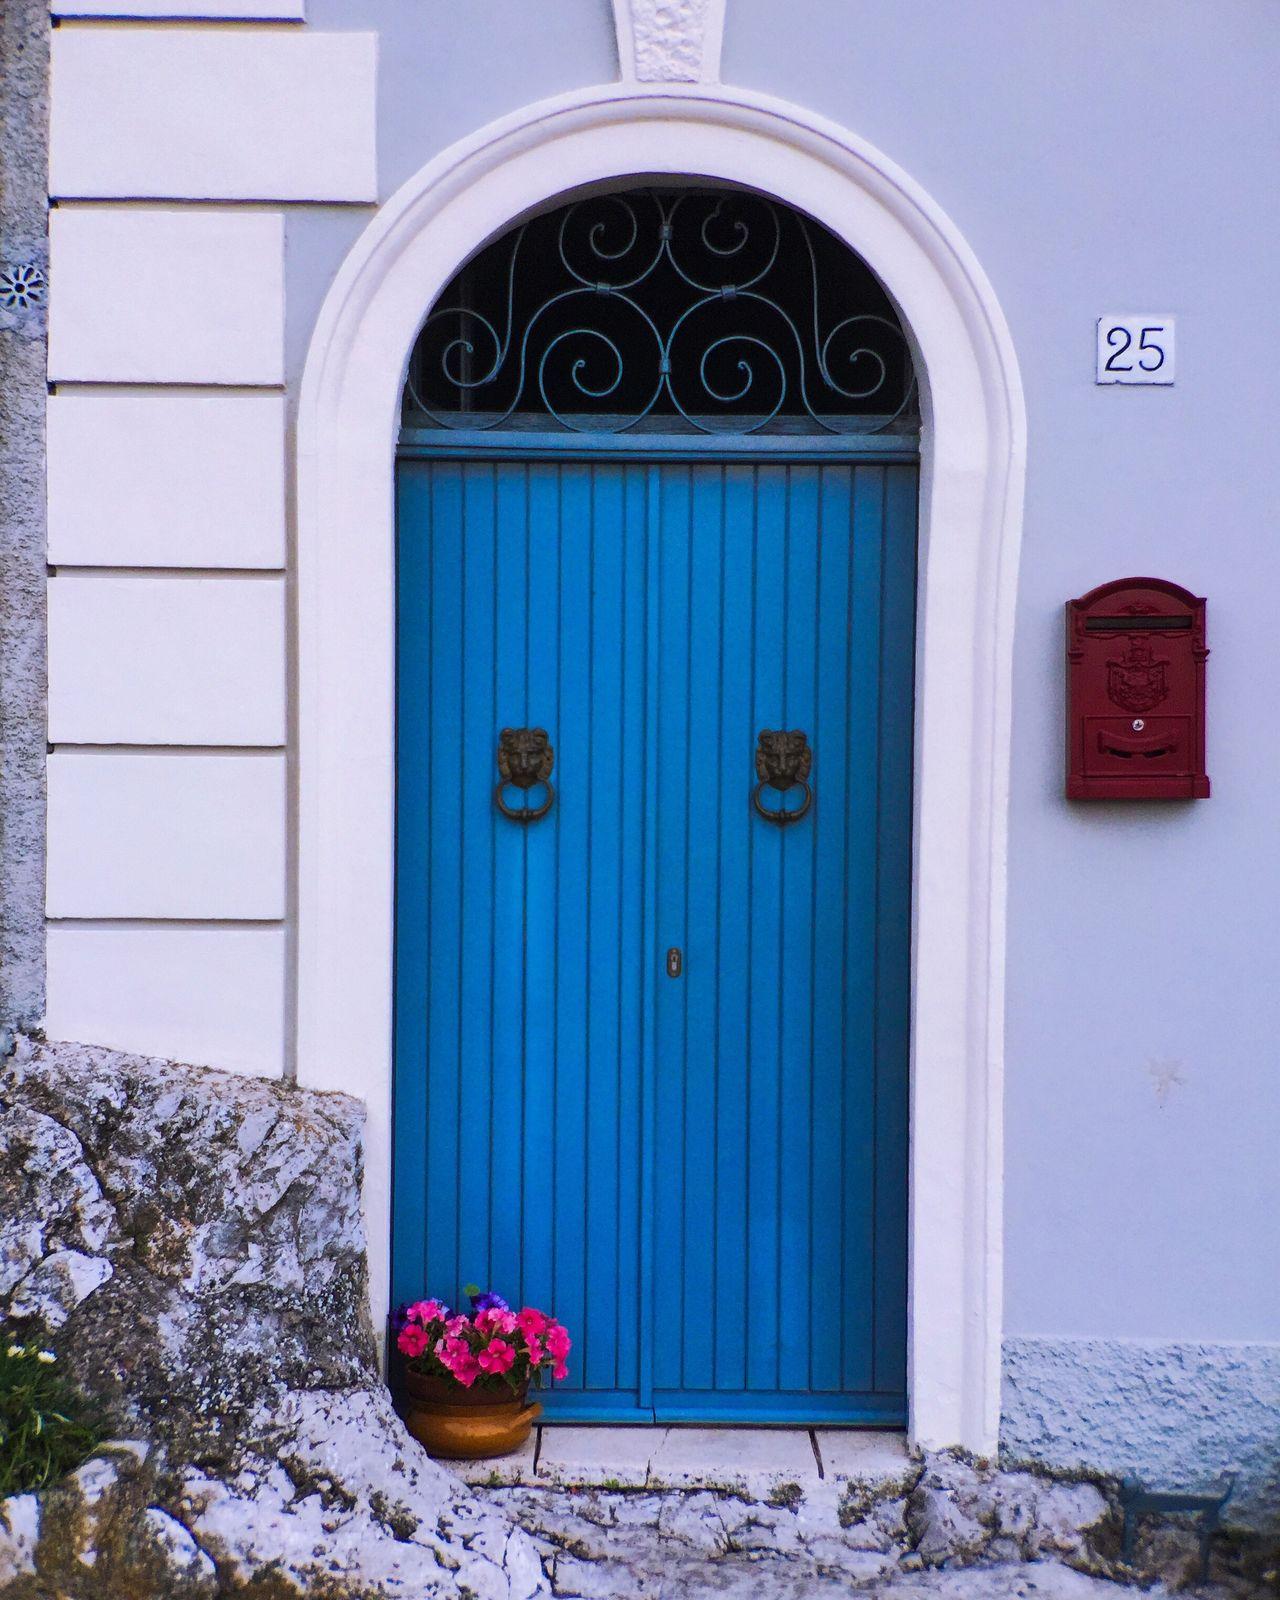 Door Blue Flower Closed Bright Vivid IPhoneography Twentyfive Italia EyeEm Gallery EyeEm Best Shots Simplicity